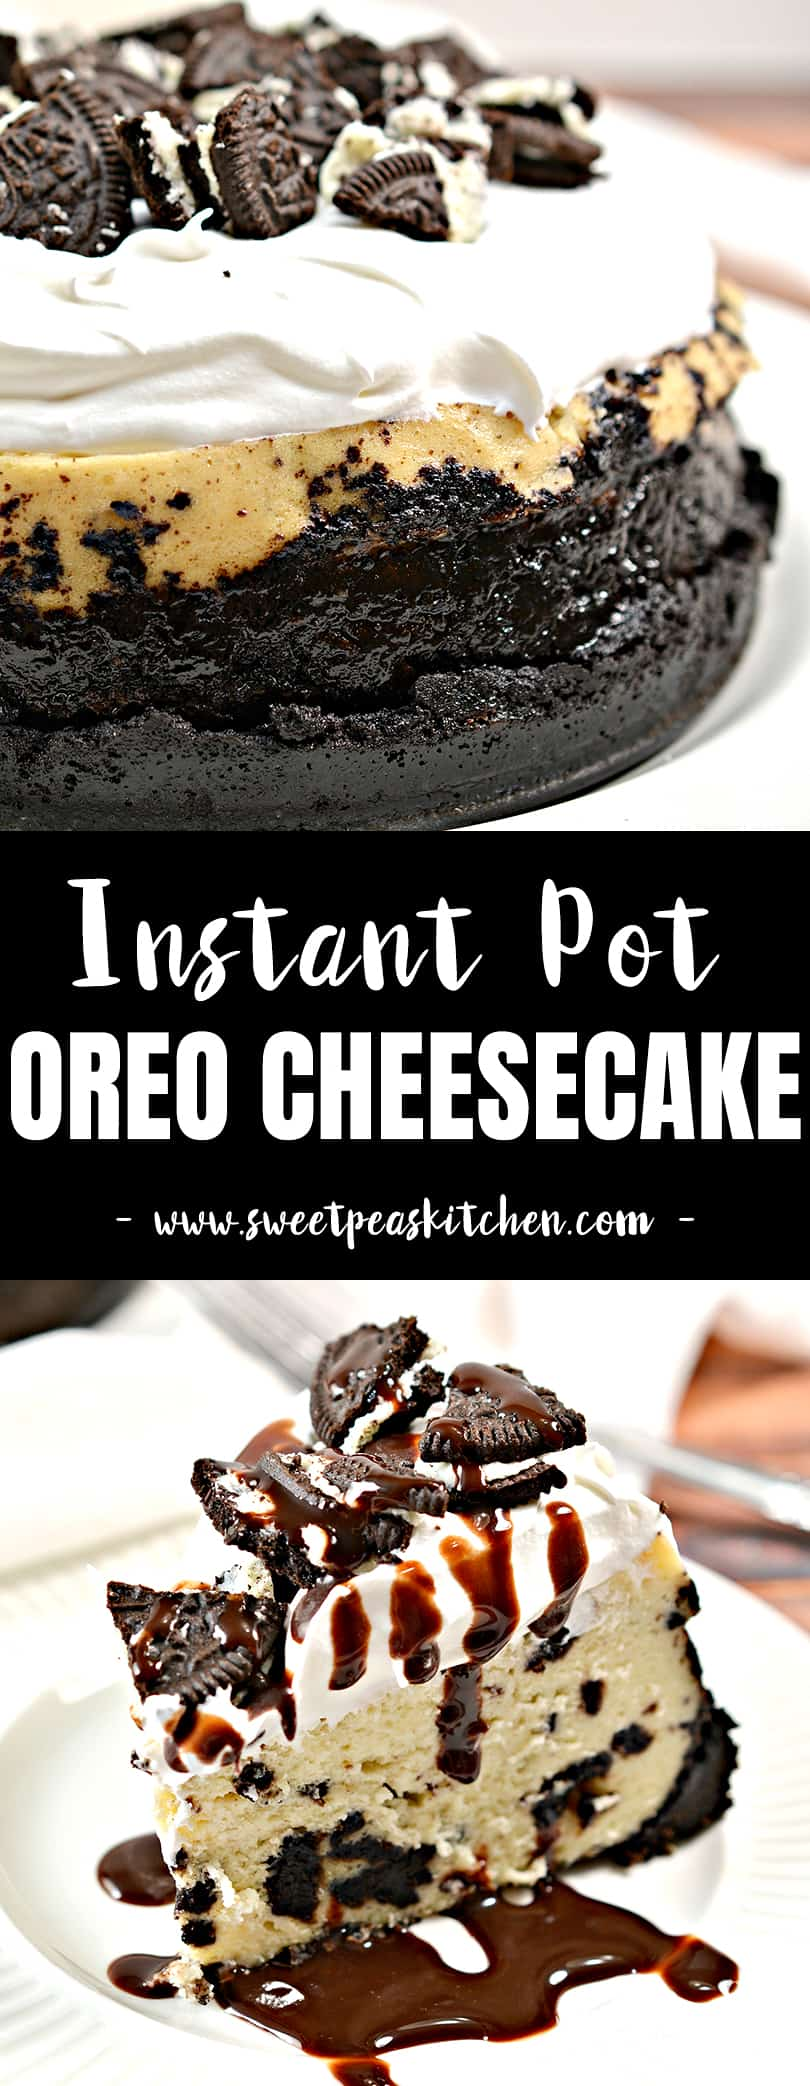 Instant Pot Oreo Cheesecake Recipe